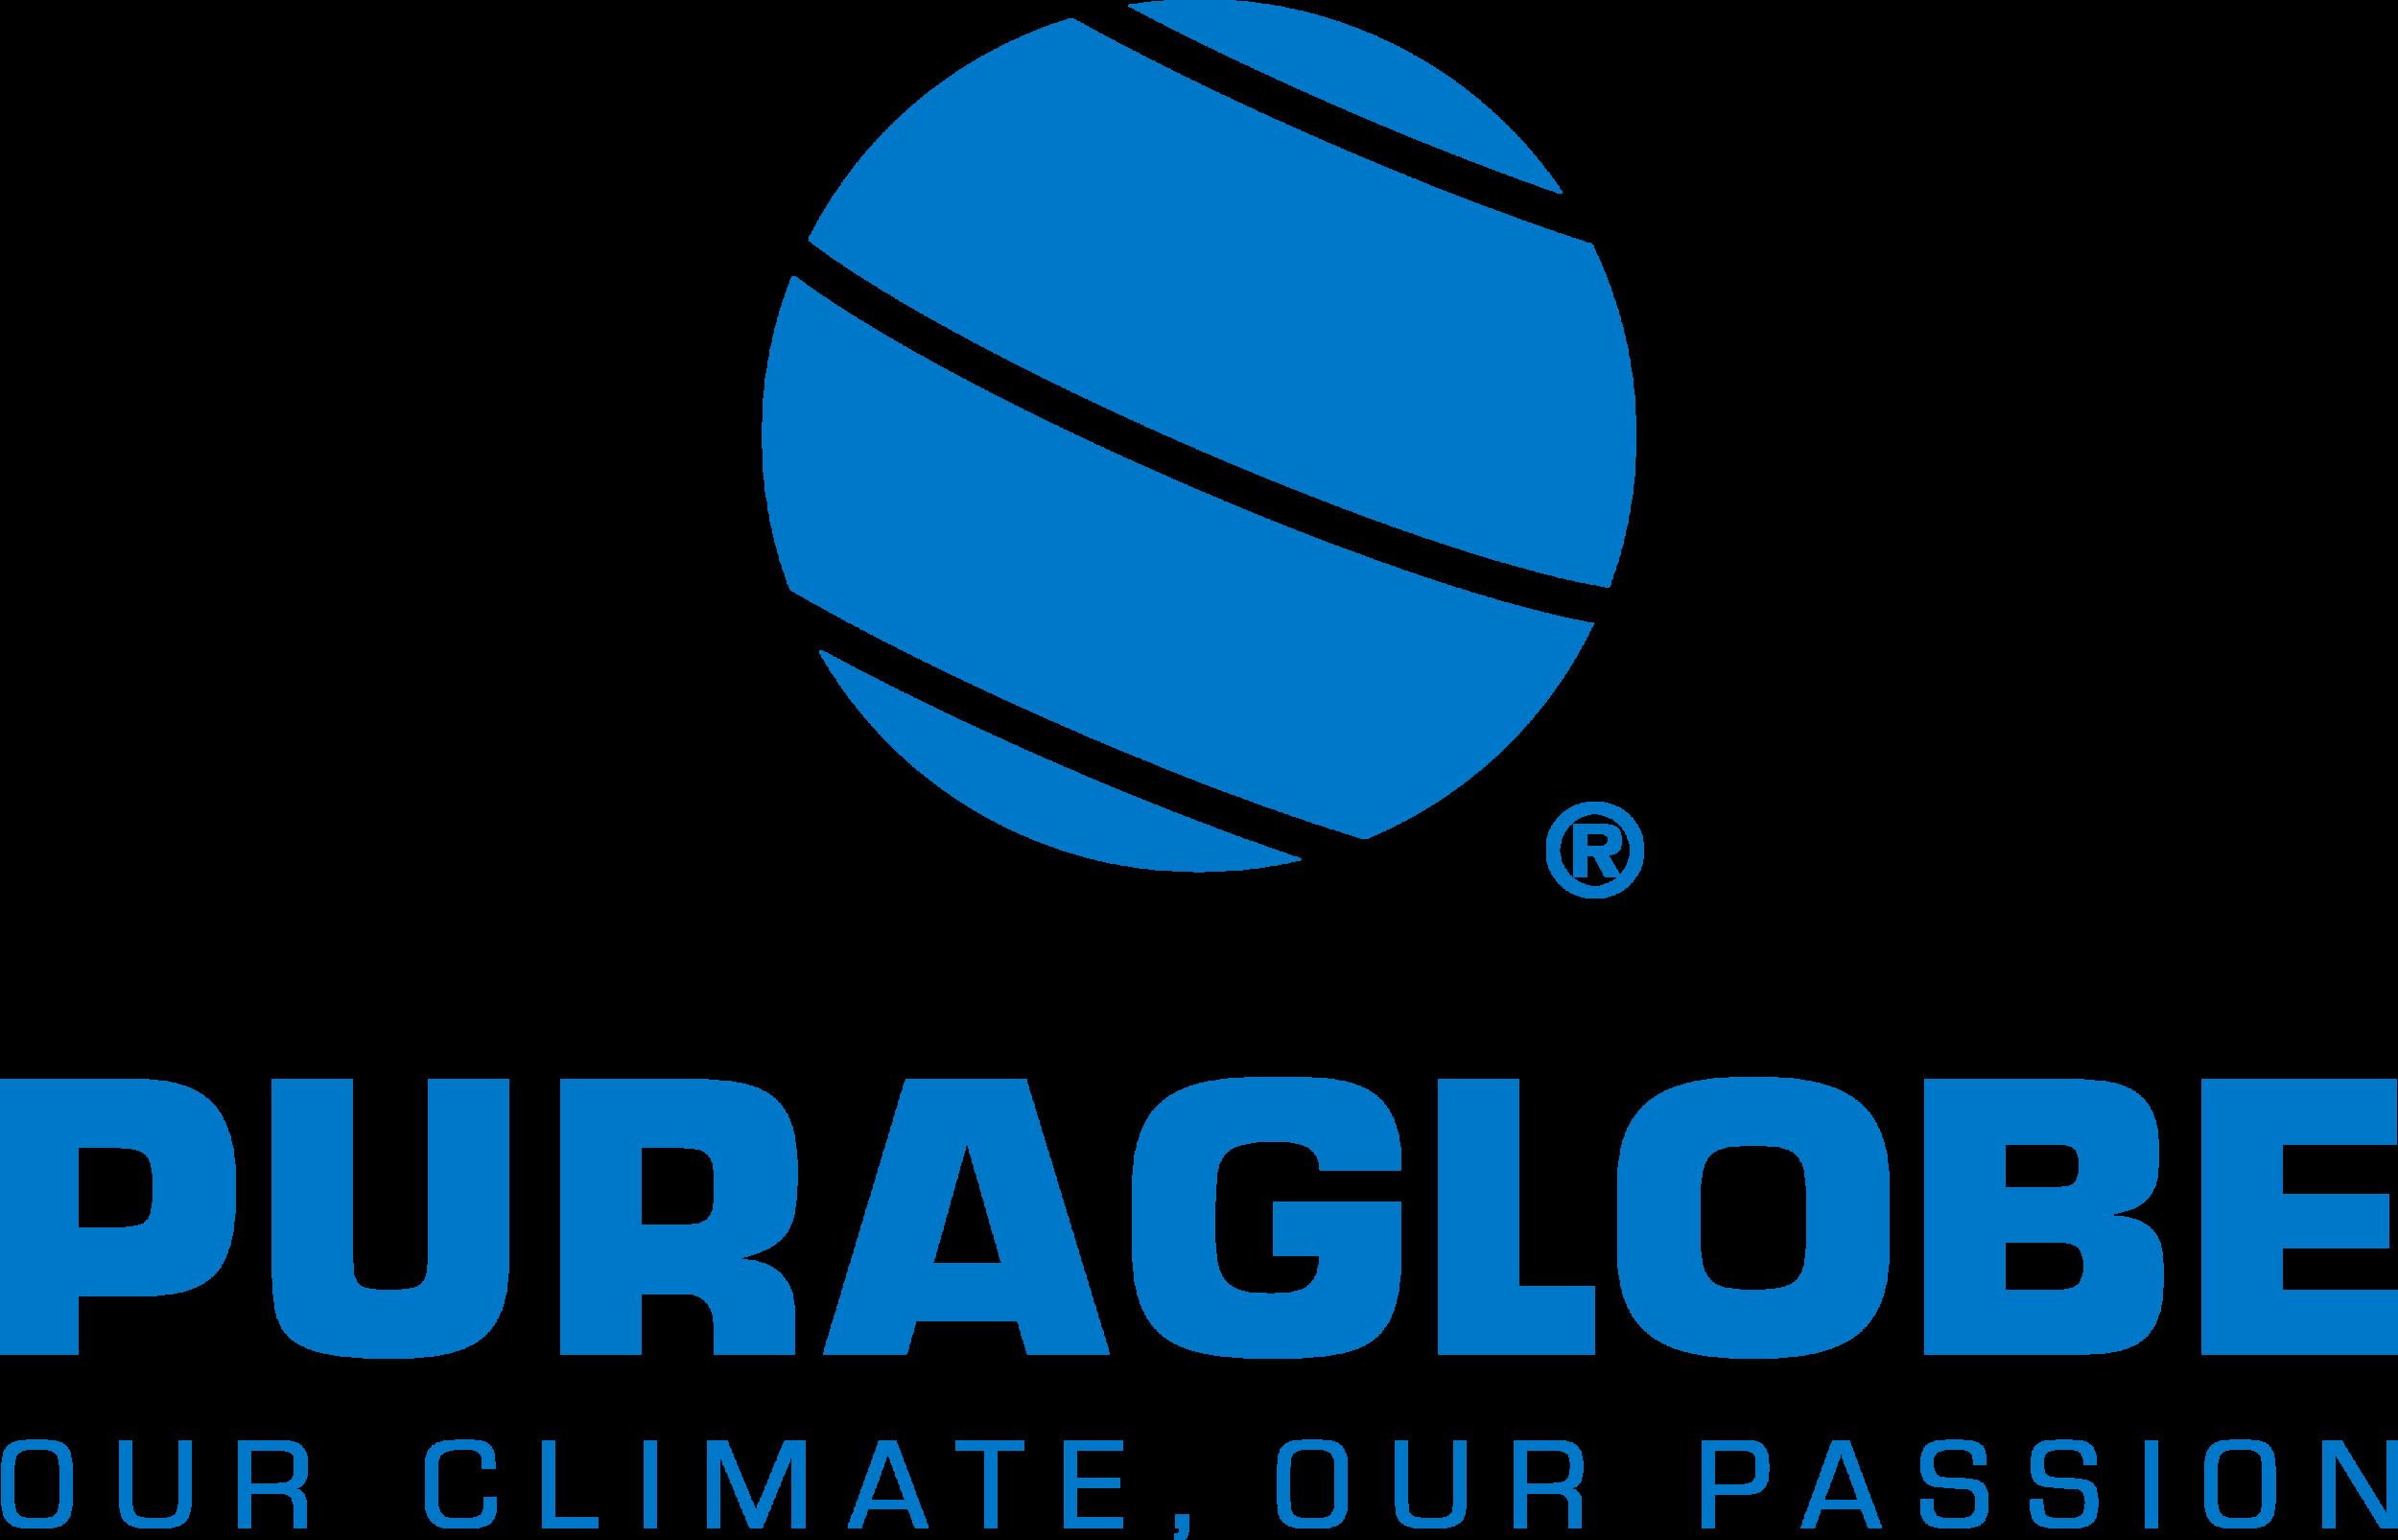 PURAGLOBE_TYPO&EARTHMARK&CLAIM_BLUE_RGB.png